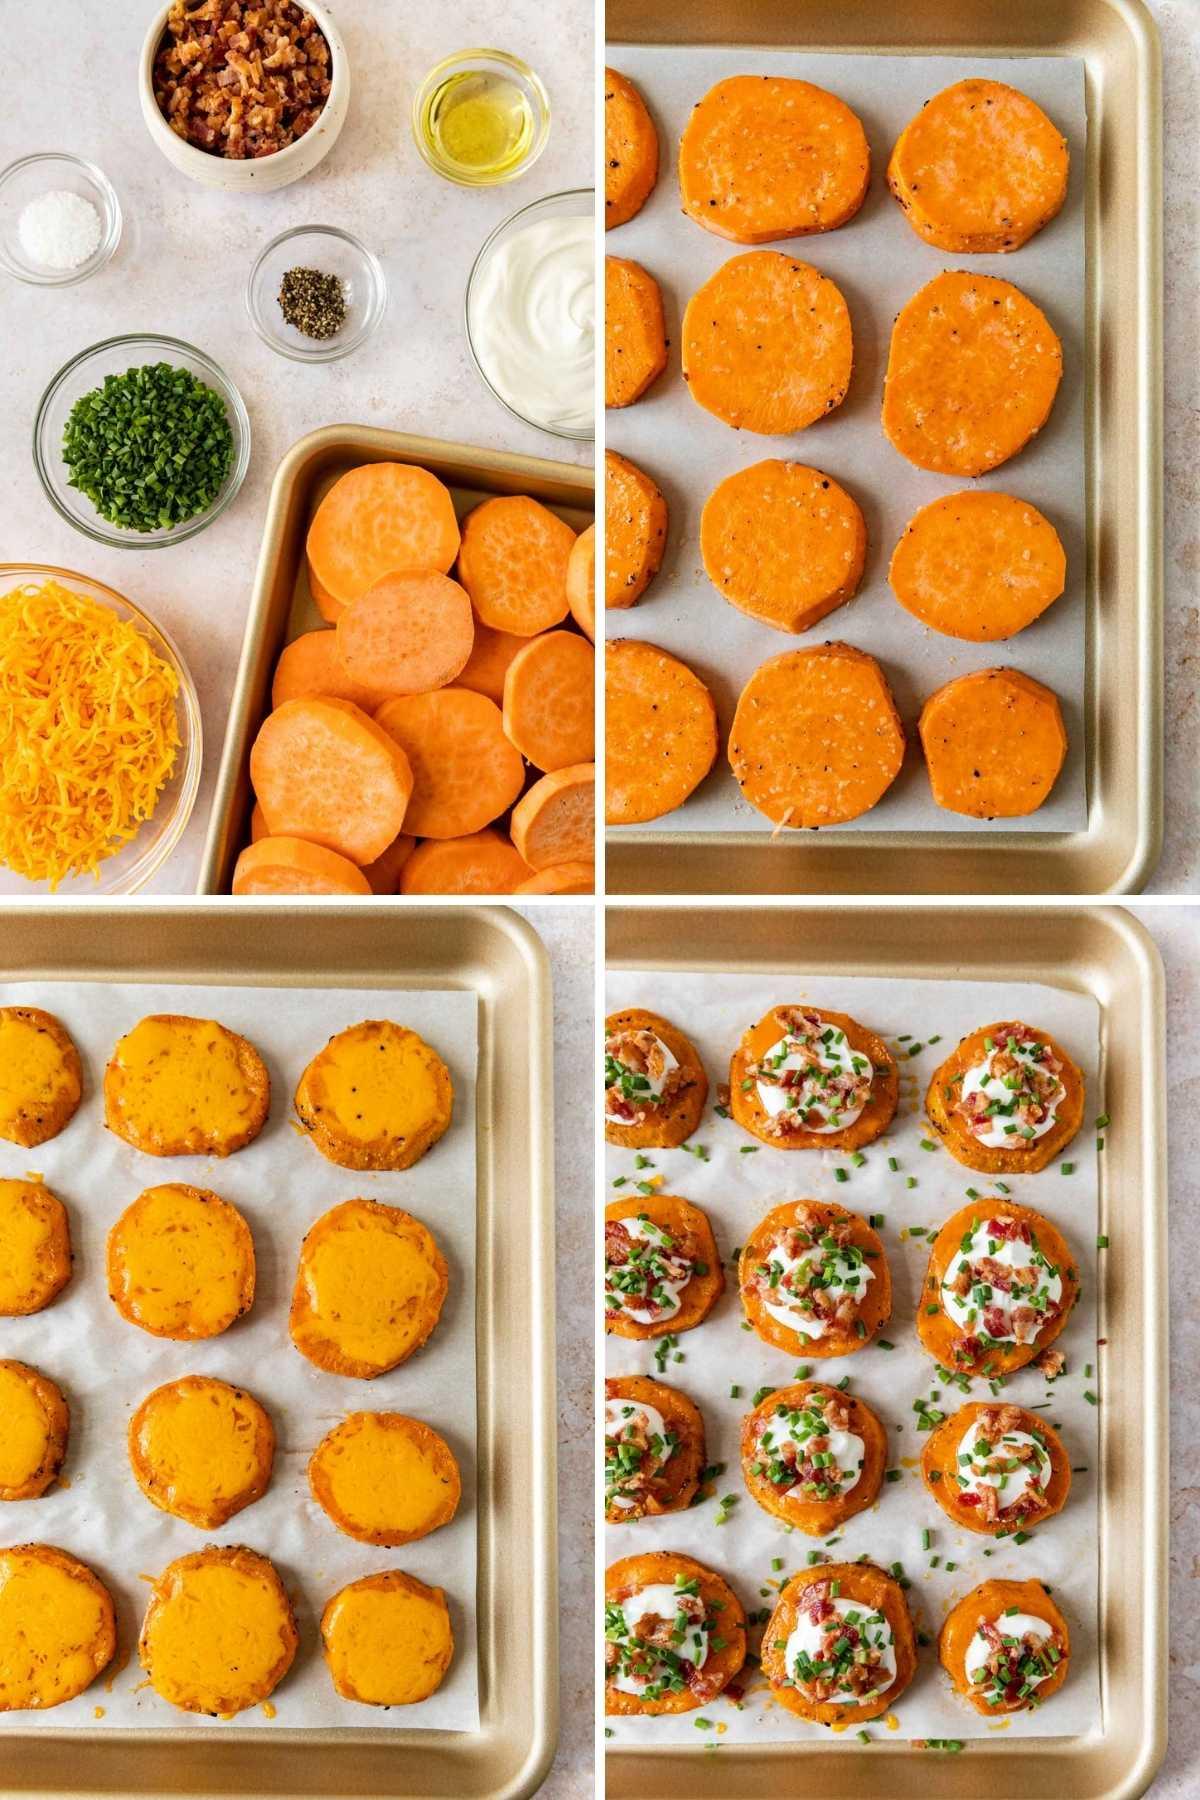 Roasted Sweet Potato Rounds prep steps